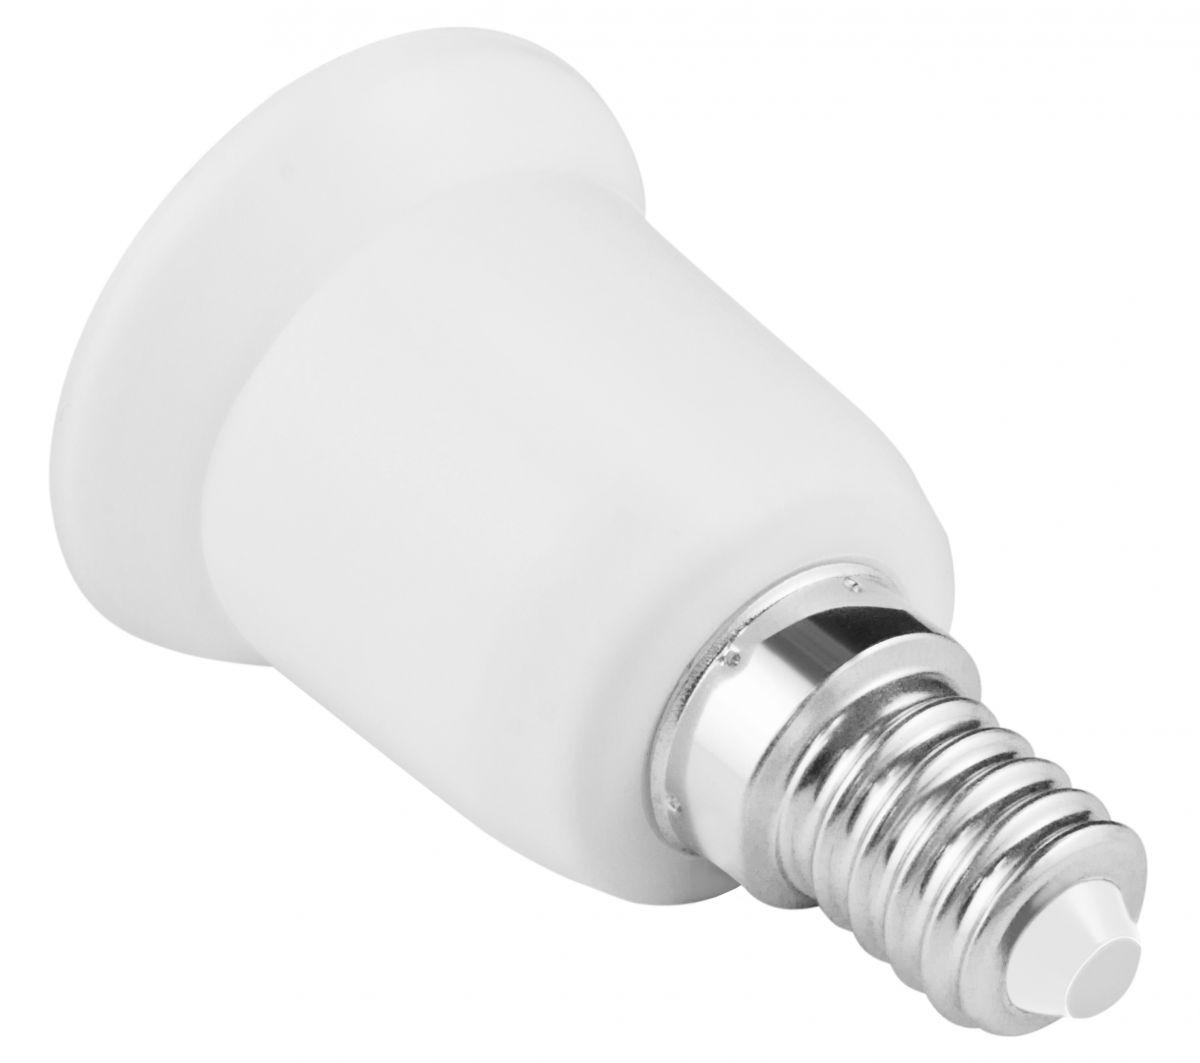 mumbi lampensockel adapter e14 auf e27 lampe leuchte sockel birne fassung bulb ebay. Black Bedroom Furniture Sets. Home Design Ideas